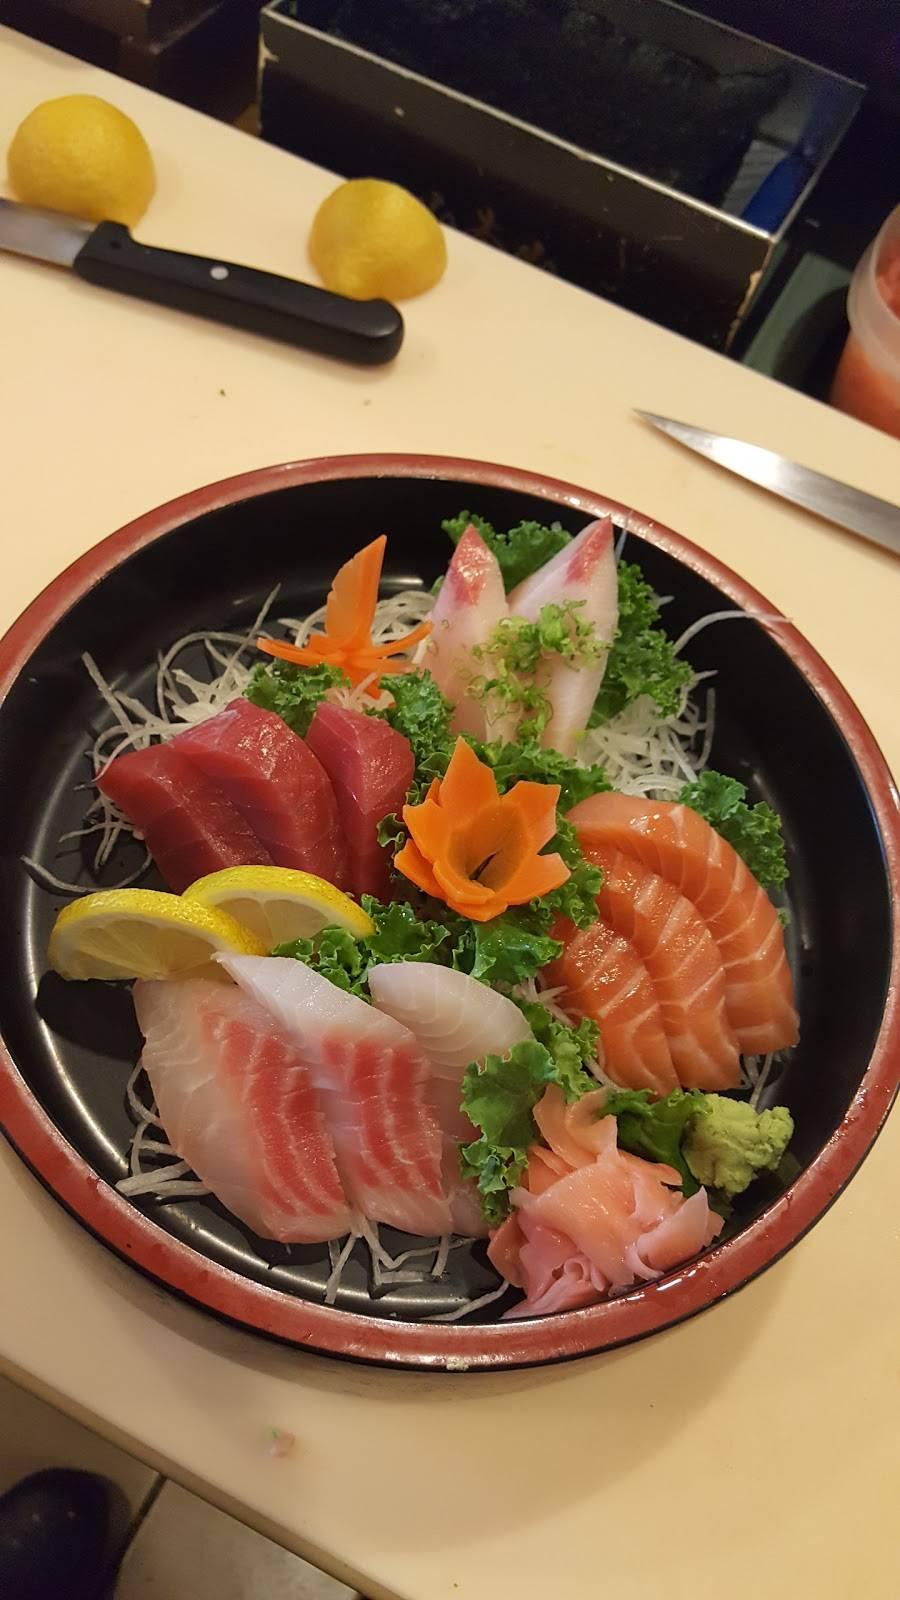 Yoko Sushi   restaurant   2946 Chain Bridge Rd # J, Oakton, VA 22124, USA   7032556644 OR +1 703-255-6644